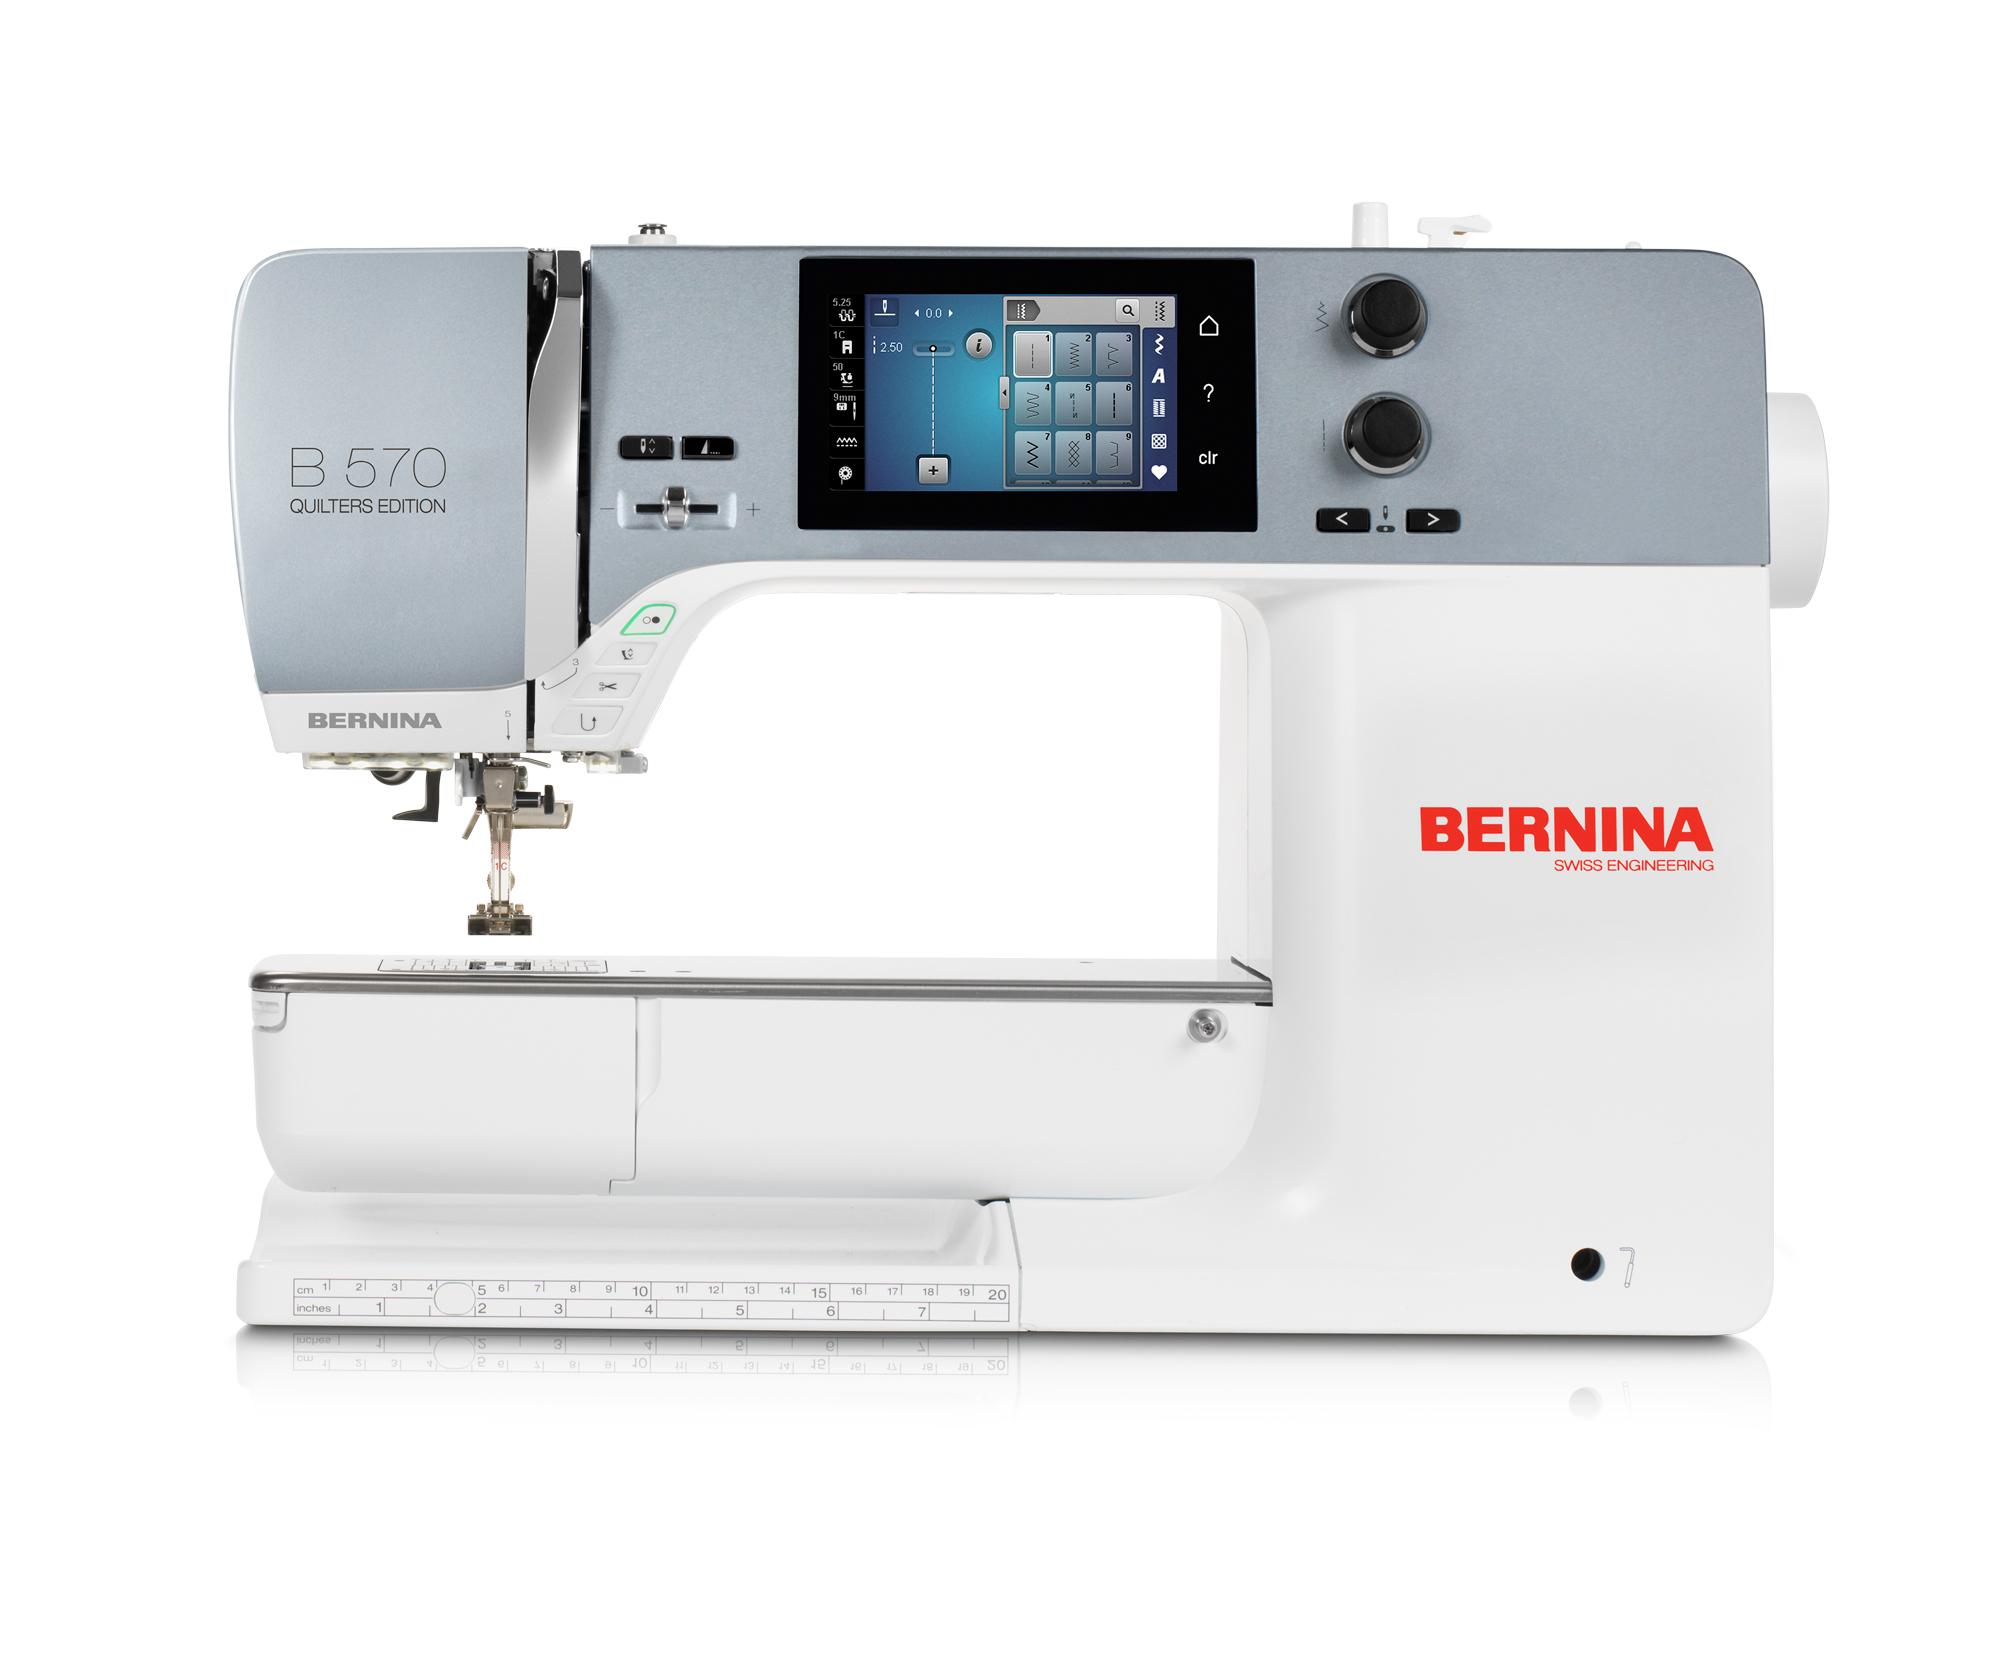 Nähmaschine Bernina 570QE - Nähen, Quilten & Sticken - Nähcenter ...